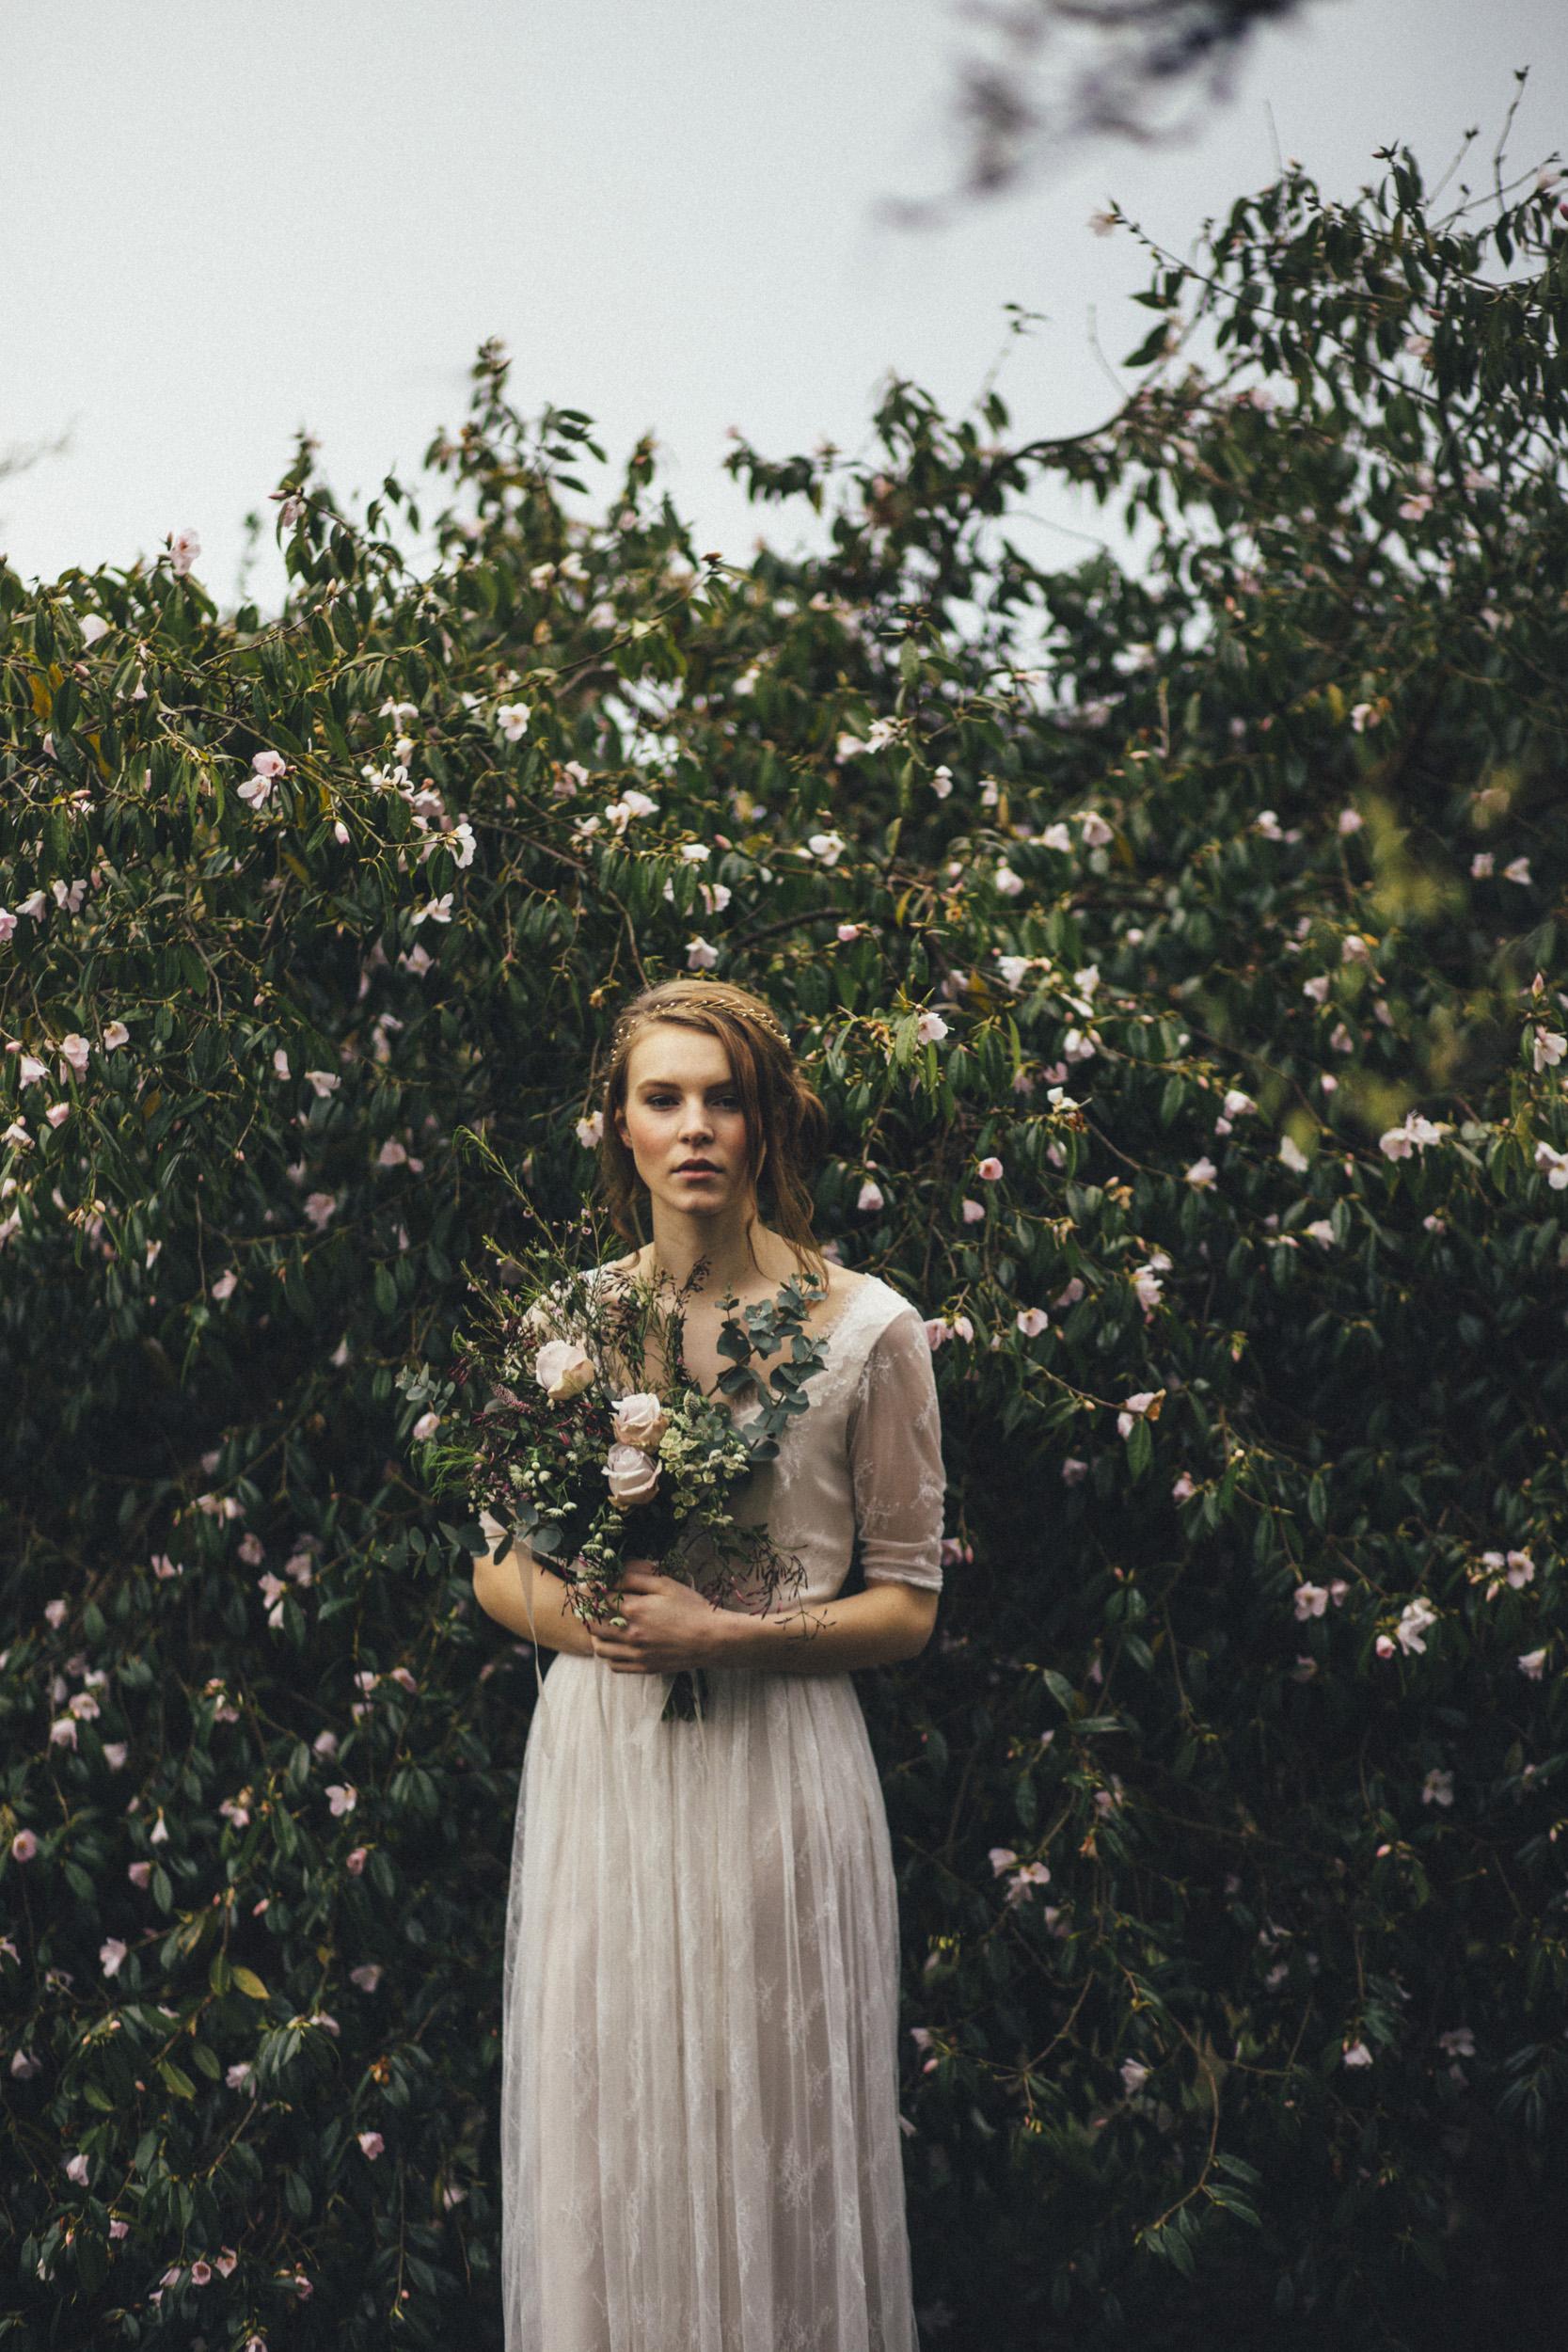 Spring-Bridal-Kate-Beaumont-Shelley-Richmond-Vintage-Wedding-Dress-8.jpg